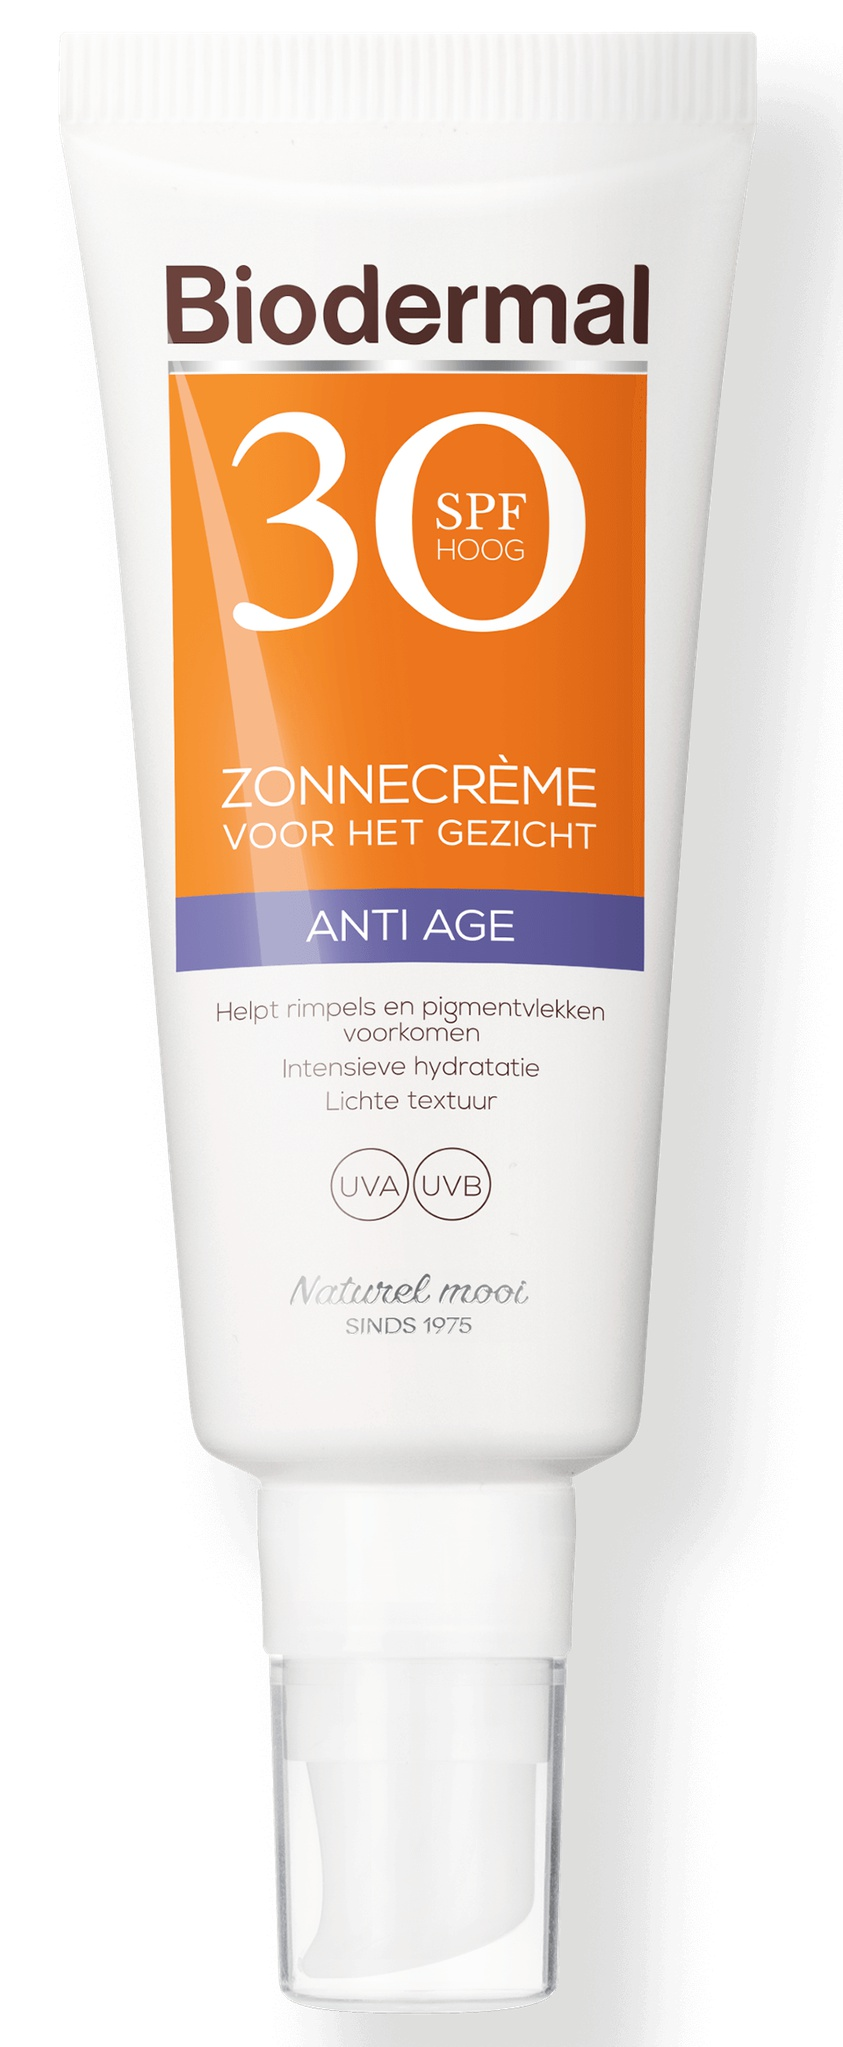 Biodermal Gezicht SPF 30 Anti Age Zonnecrème